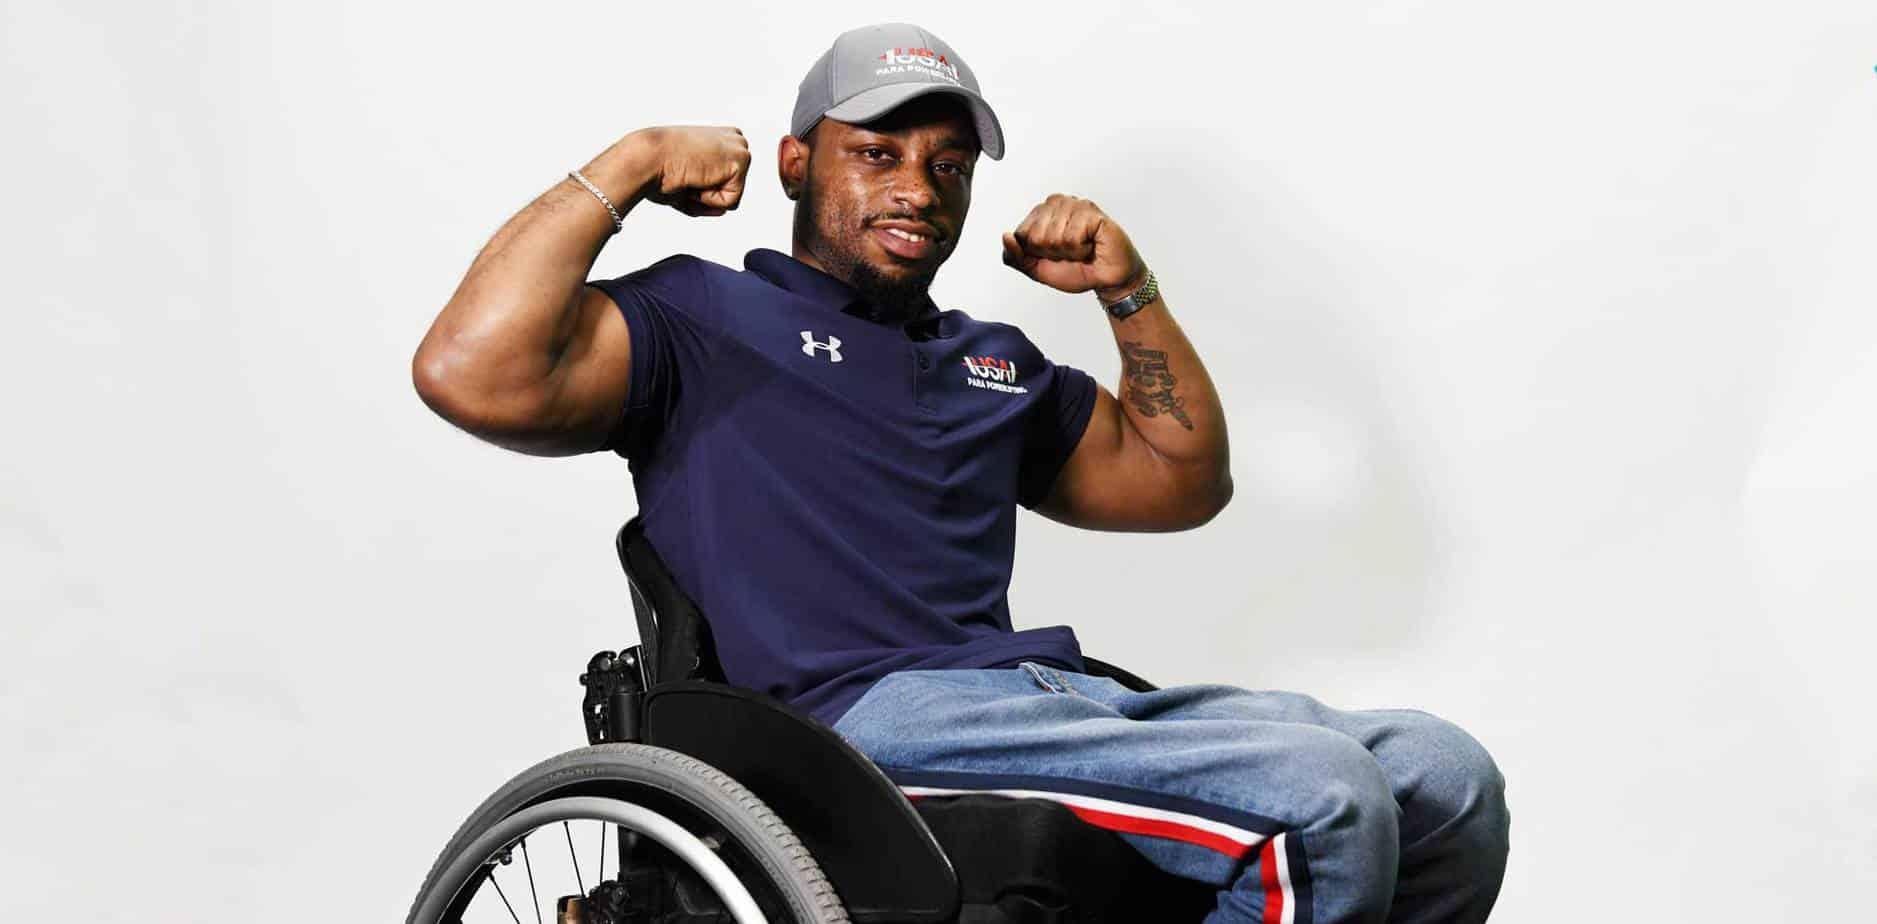 Garrison Redd: Brains, Brawn and a Wheelchair